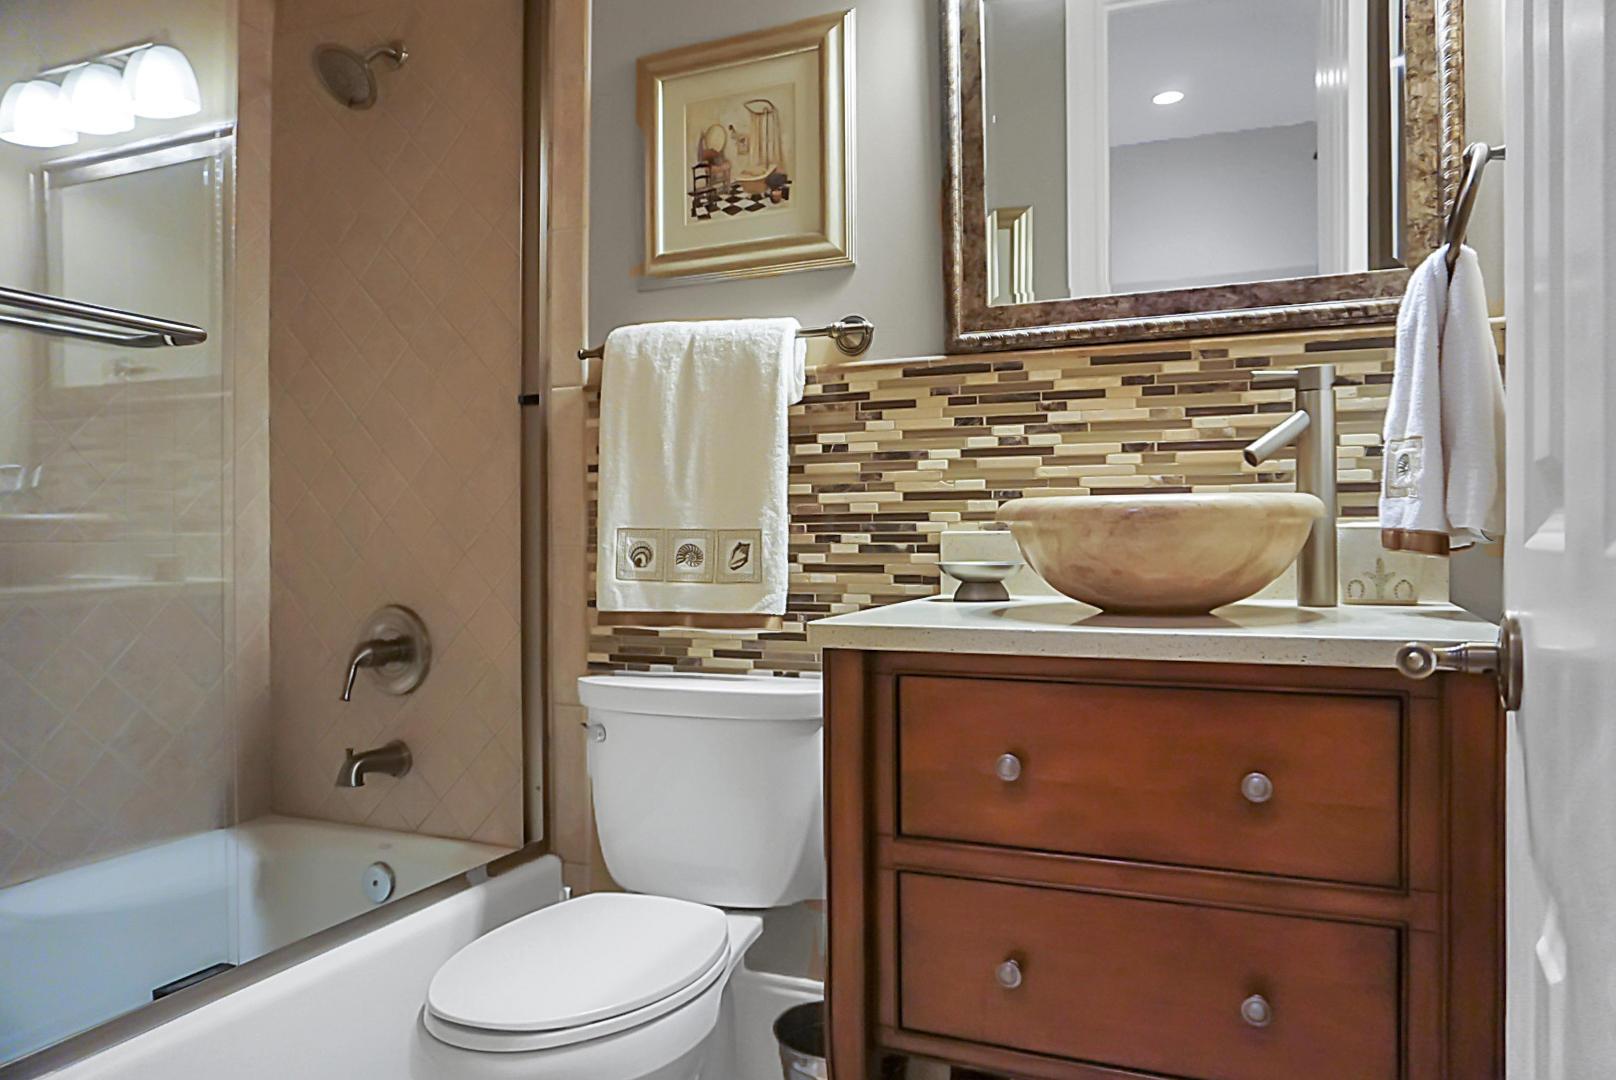 Dunes West Homes For Sale - 2389 Darts Cove, Mount Pleasant, SC - 31